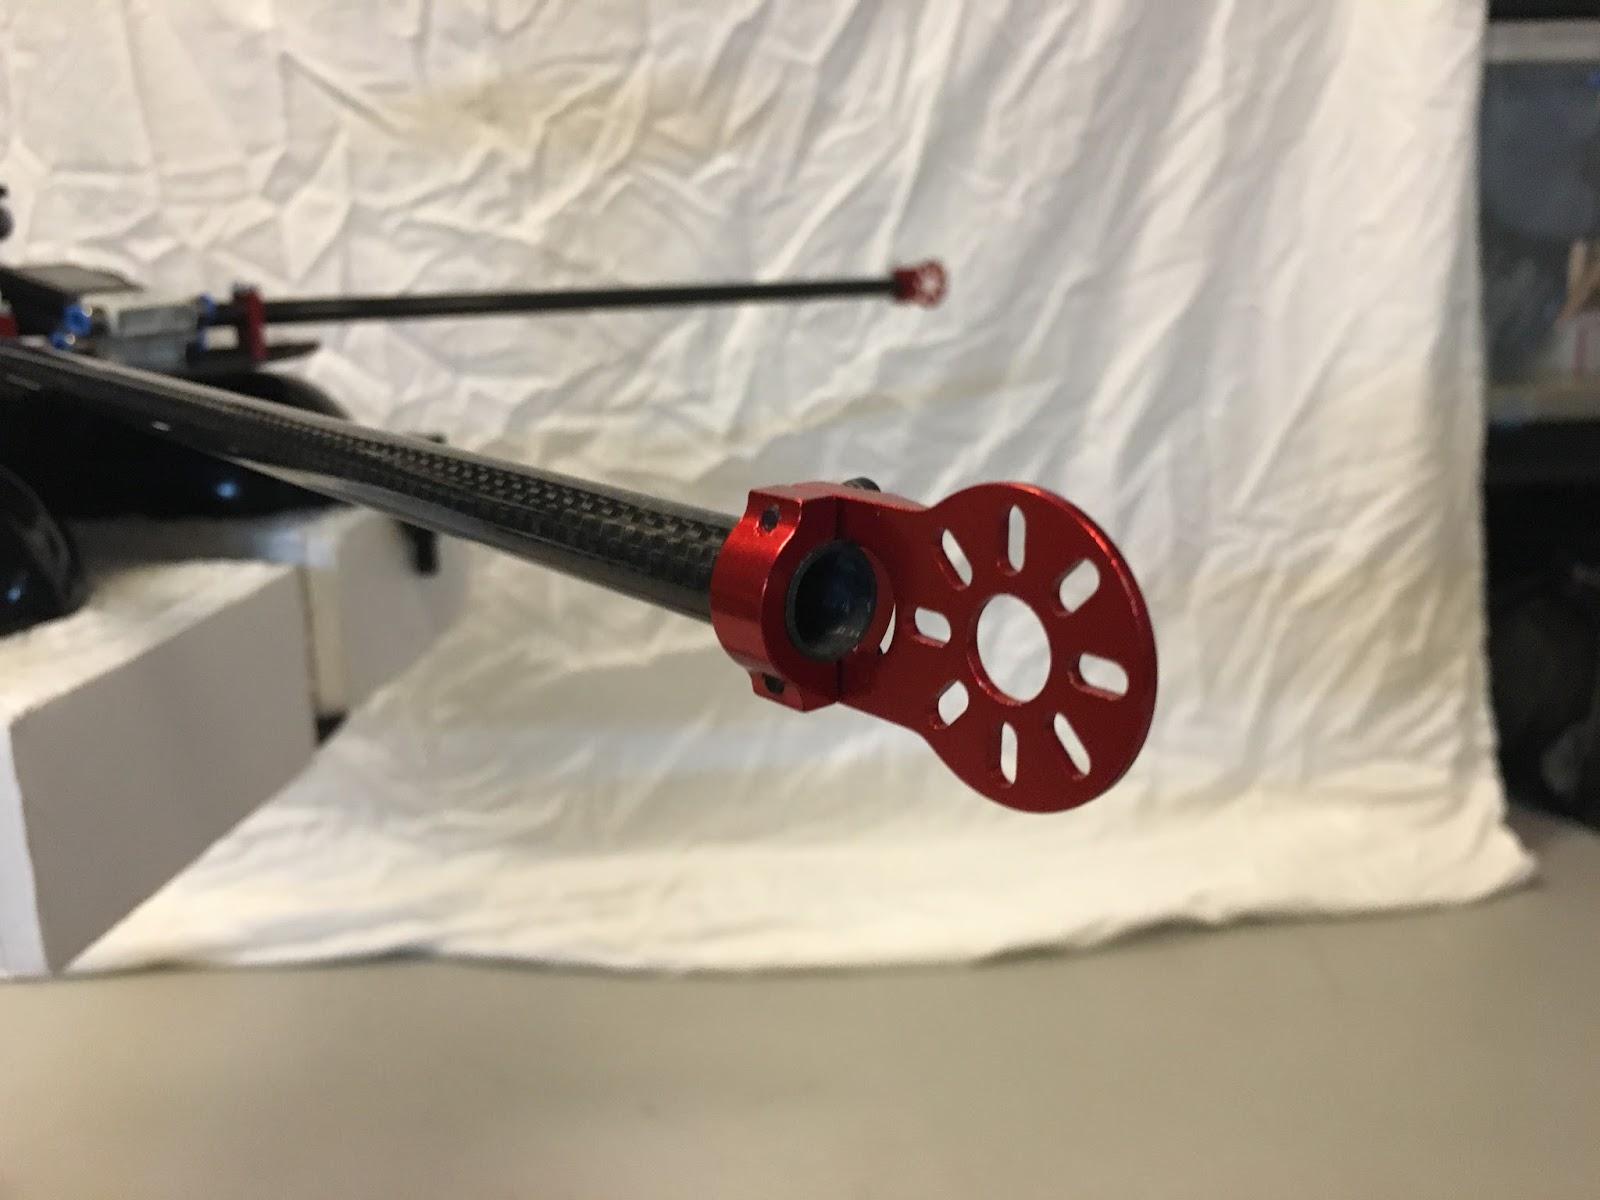 Jet nozzle attachment brackets (red anodized aluminum)